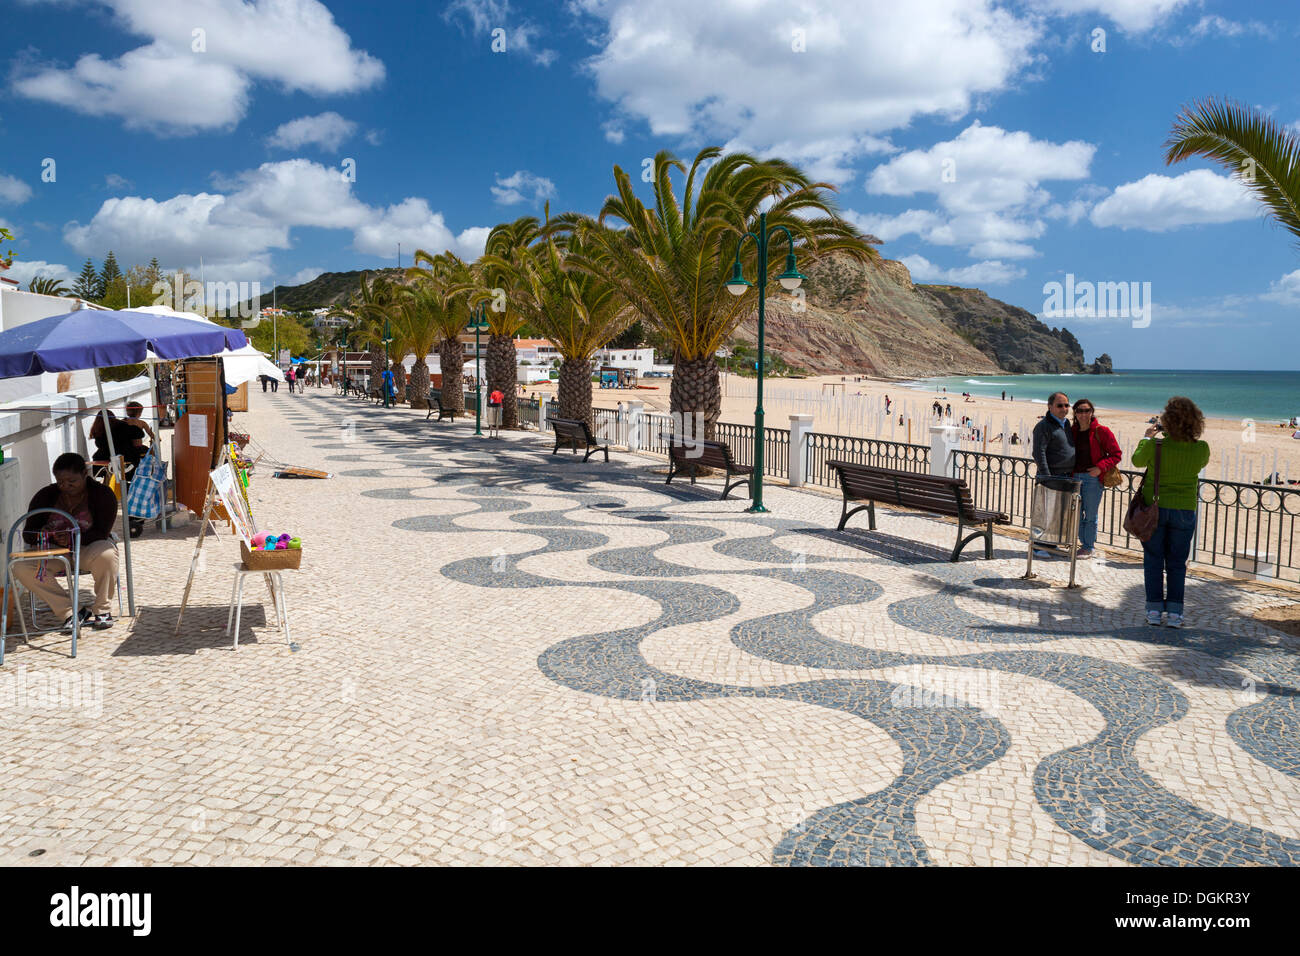 Beach promenade at Praia da Luz. - Stock Image